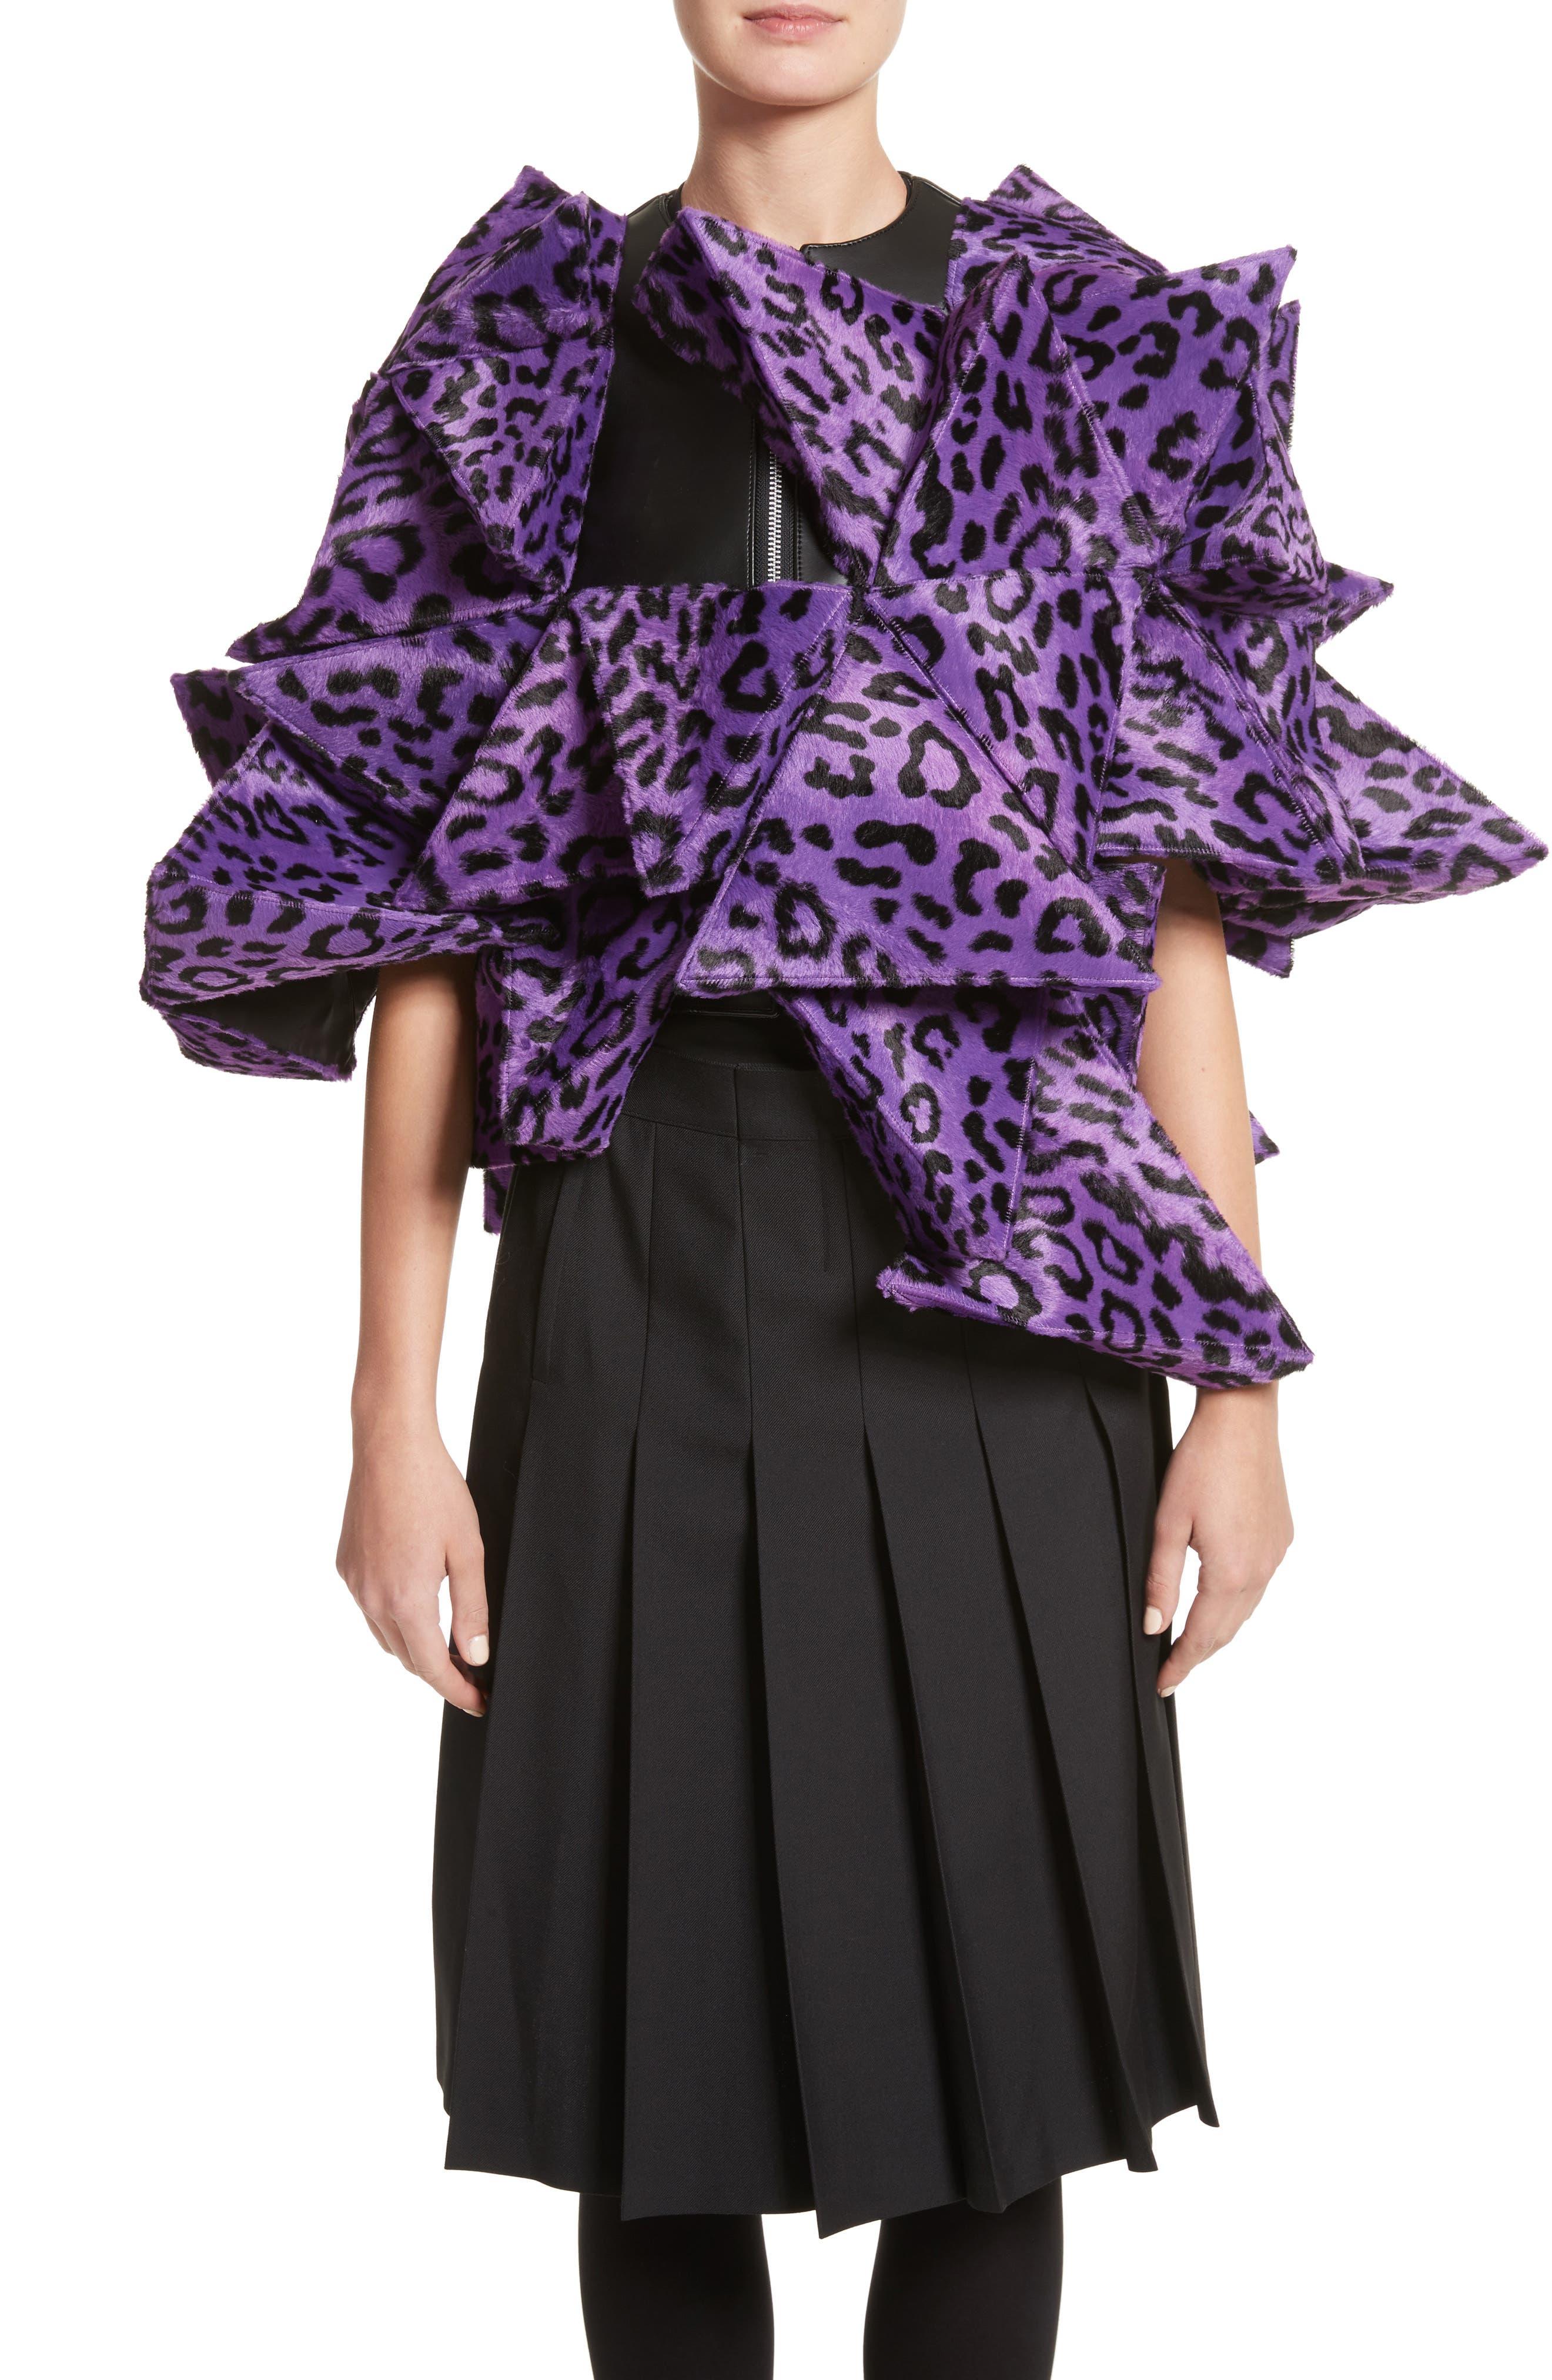 Junya Watanabe Origami Faux Cheetah Jacket